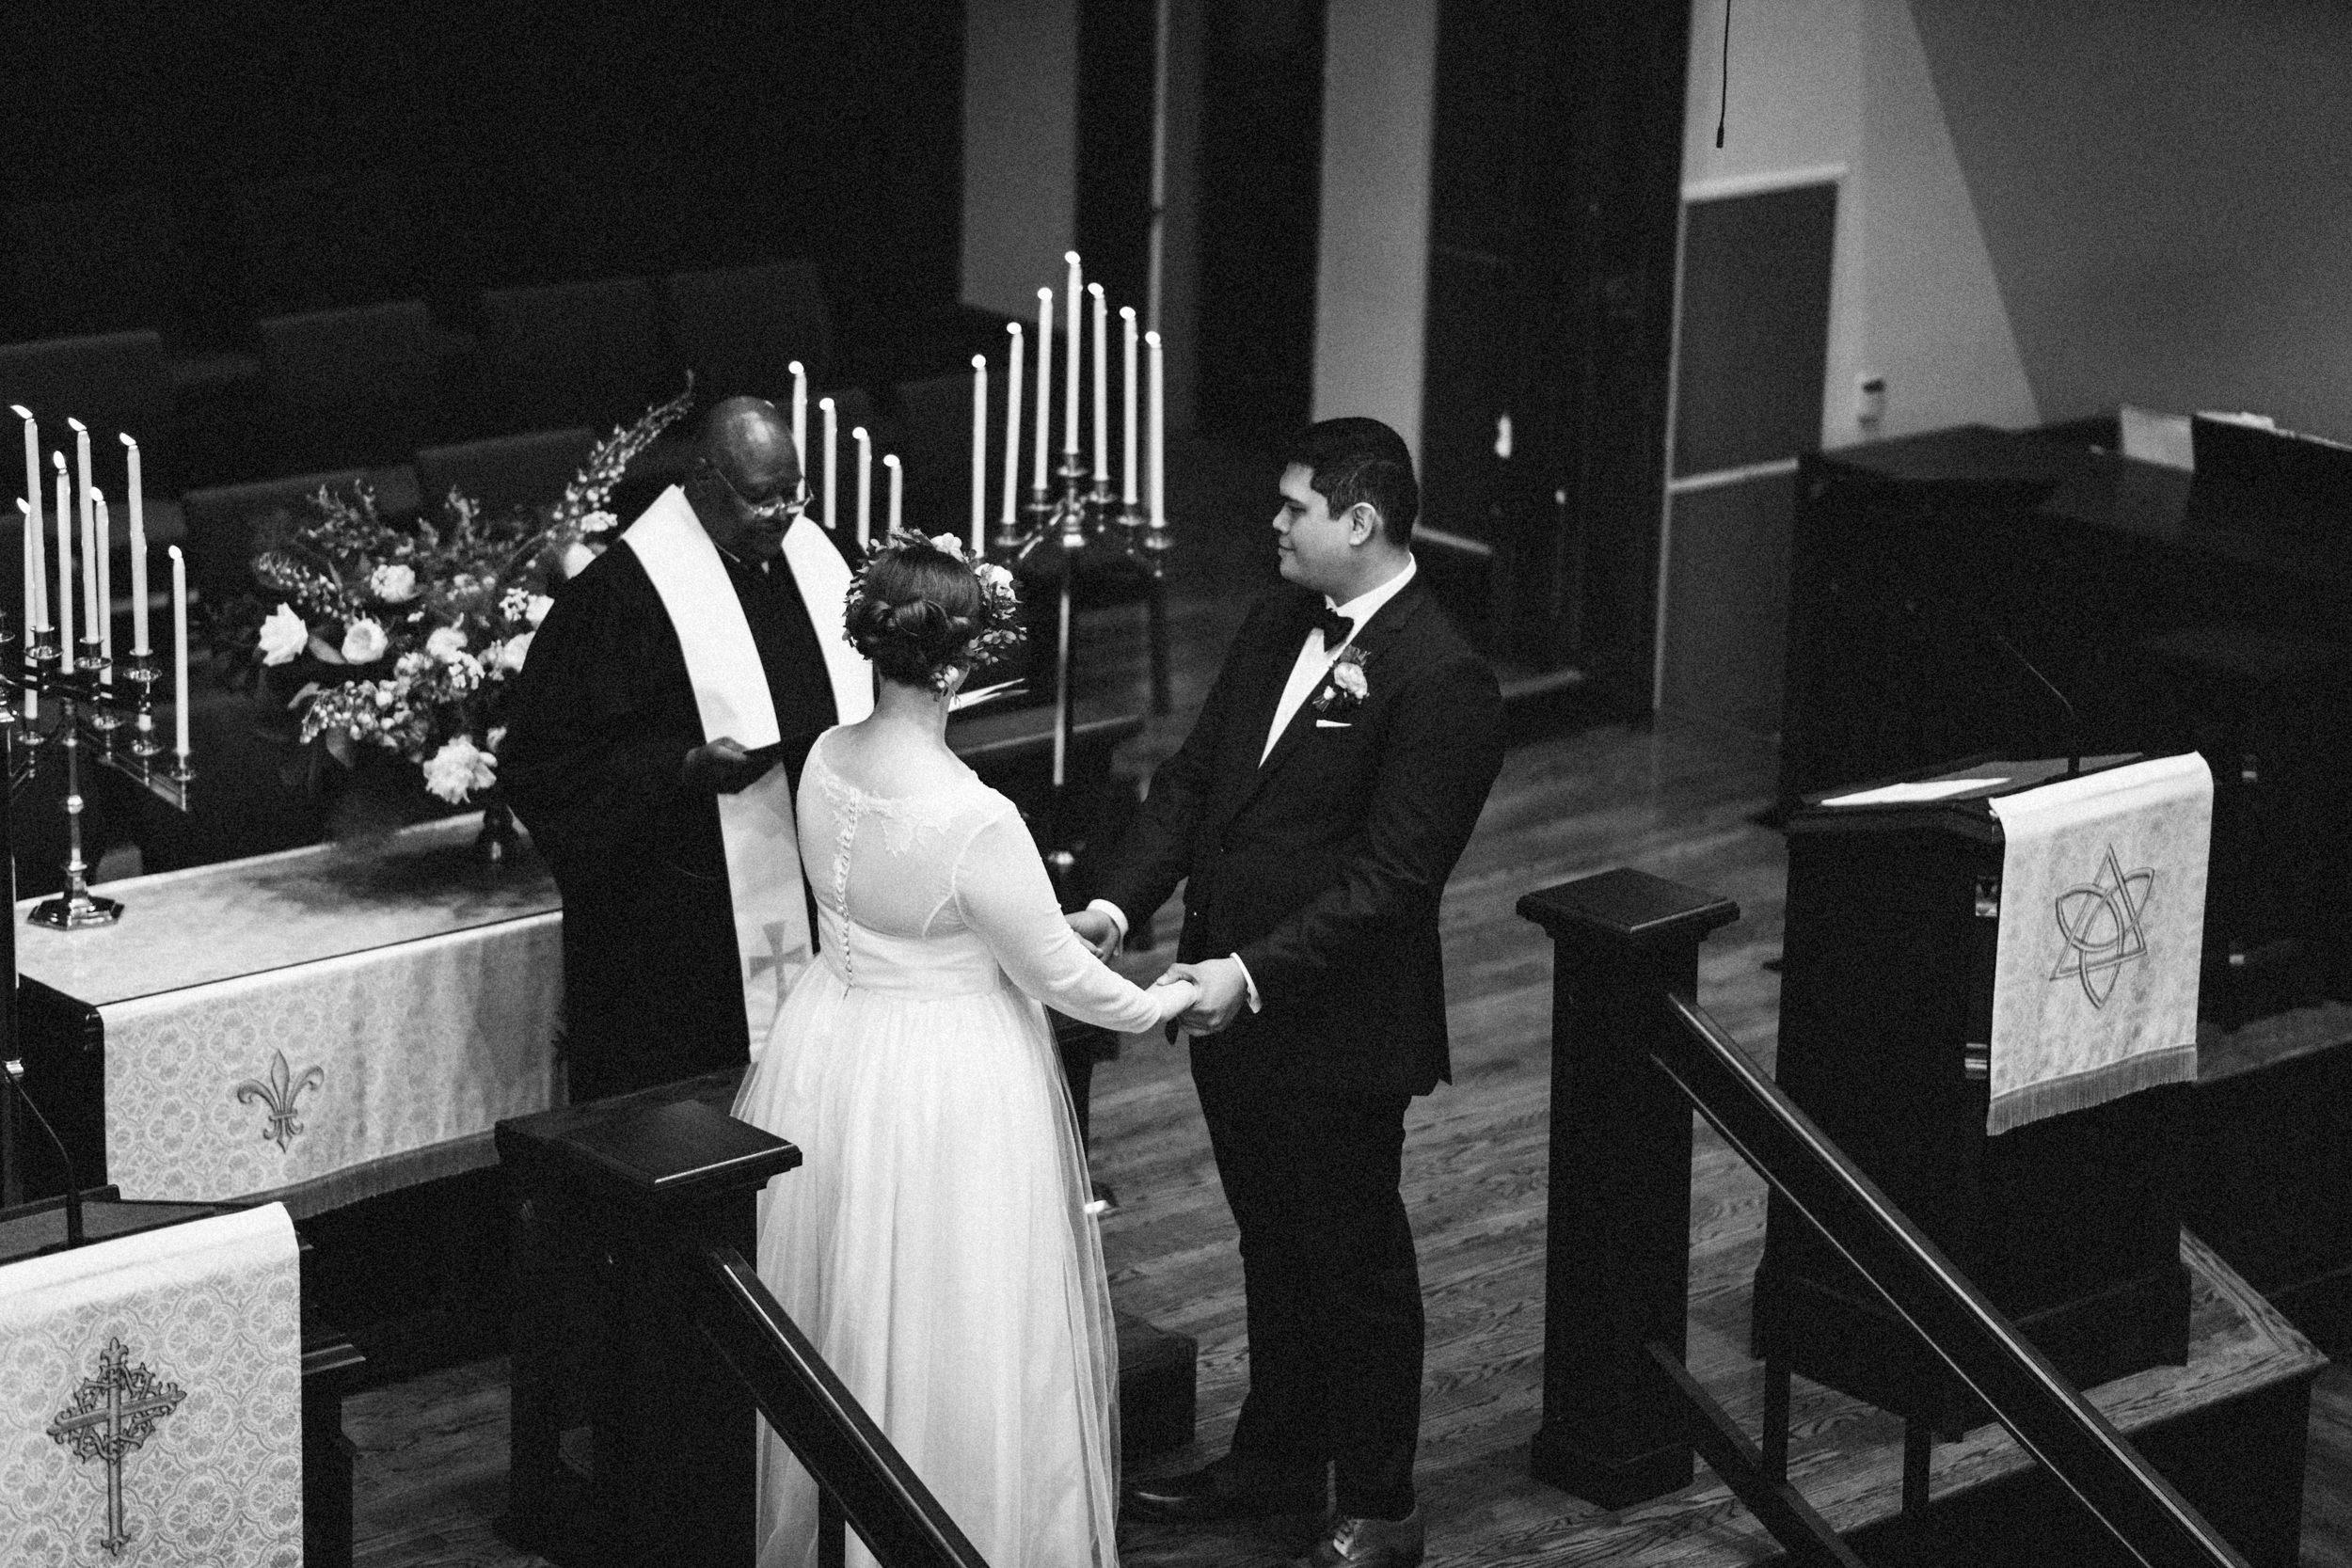 lauren-dean-wedding-grand-lodge-kentucky-sarah-katherine-davis-photography-338bw.jpg